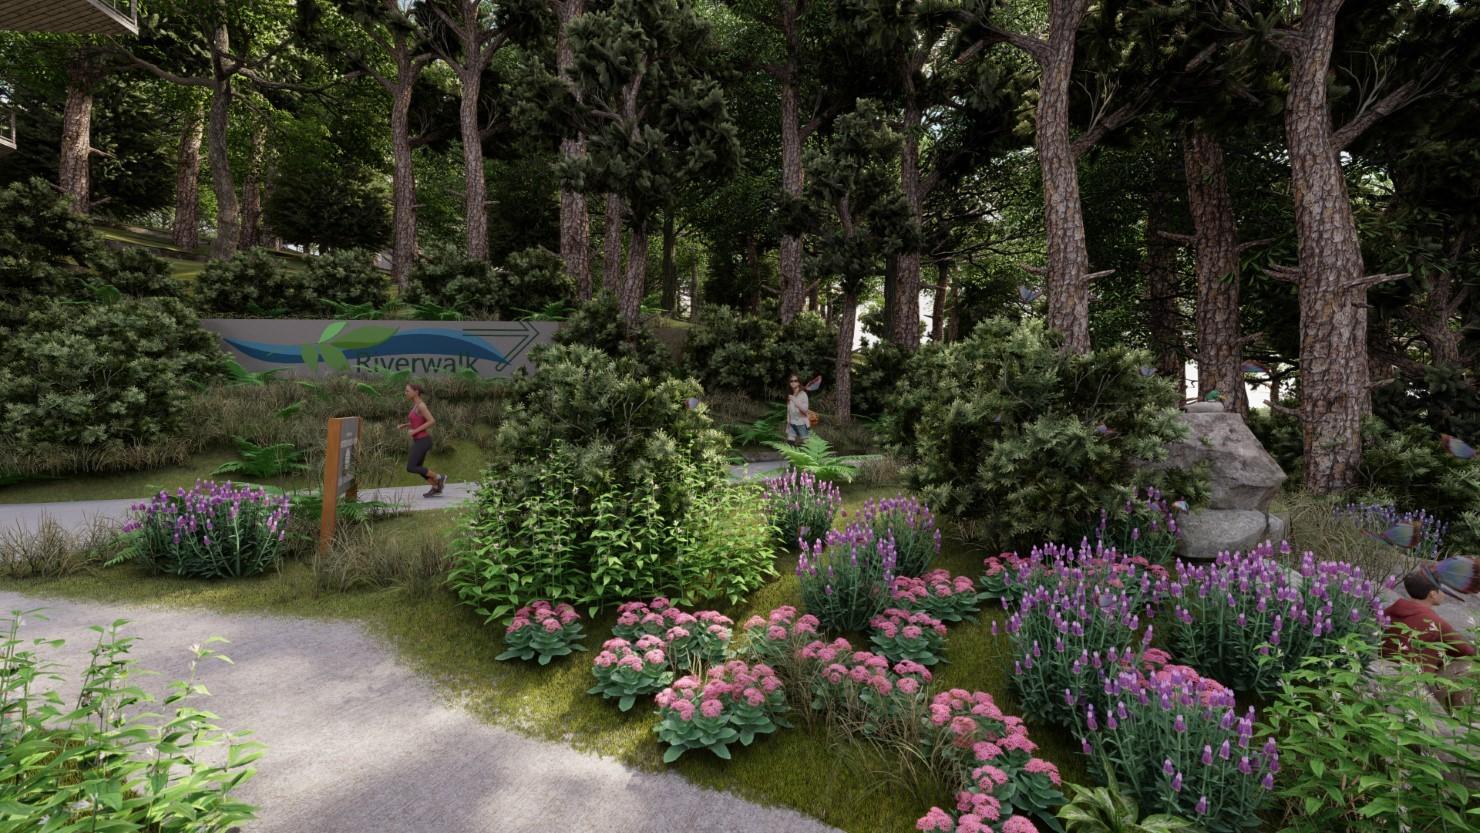 Deidra Lackey Memorial Park